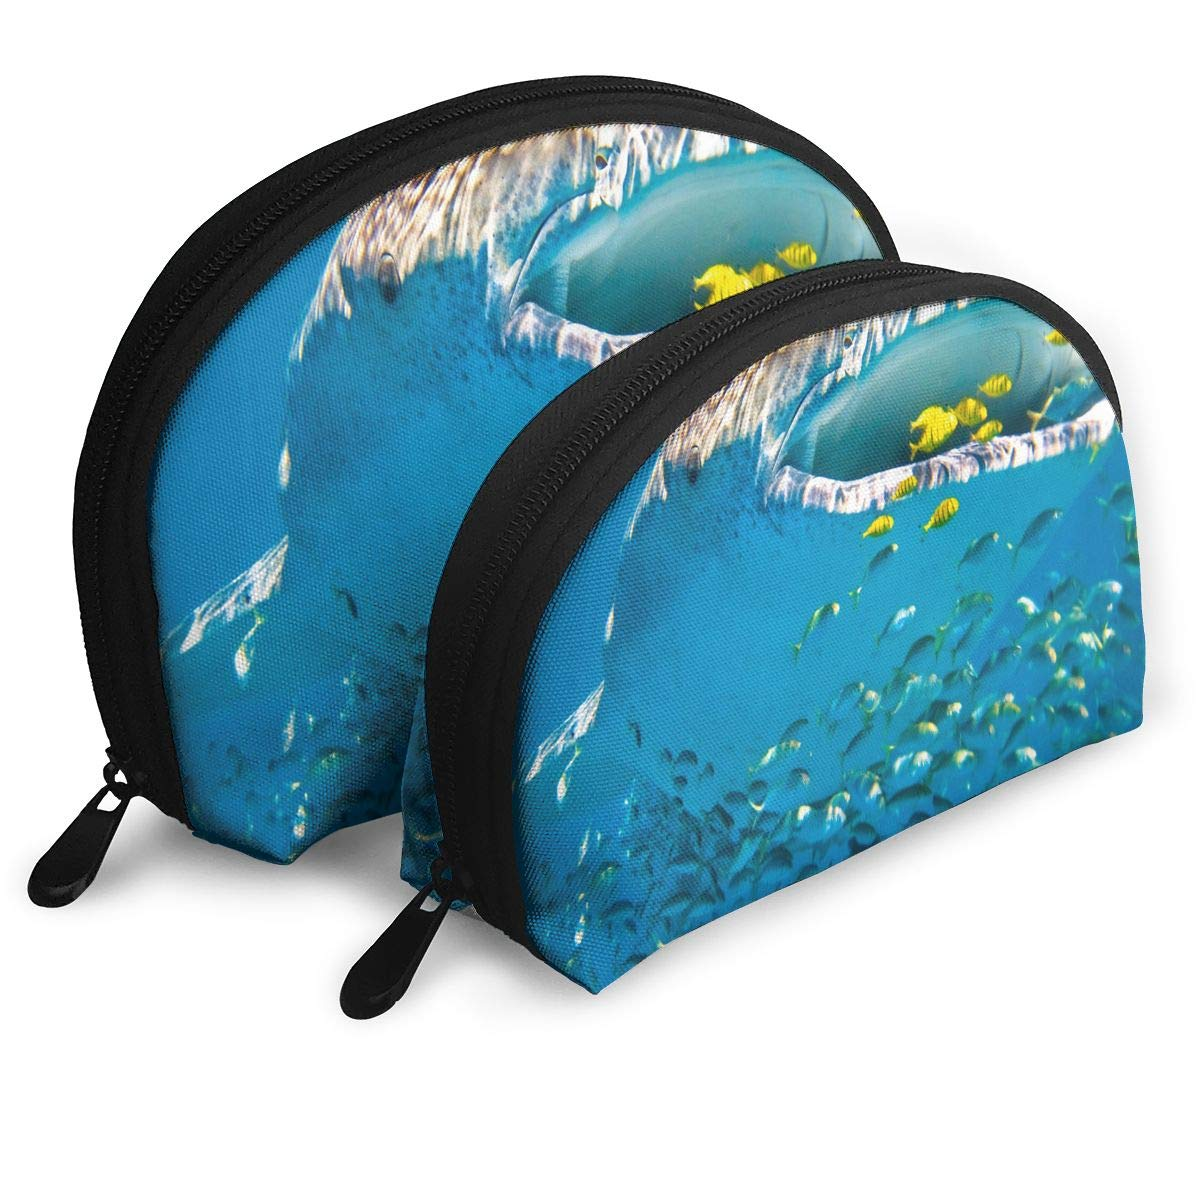 89836911f477 Amazon.com : Makeup Bag WHALE SHARK Portable Shell Toiletry ...